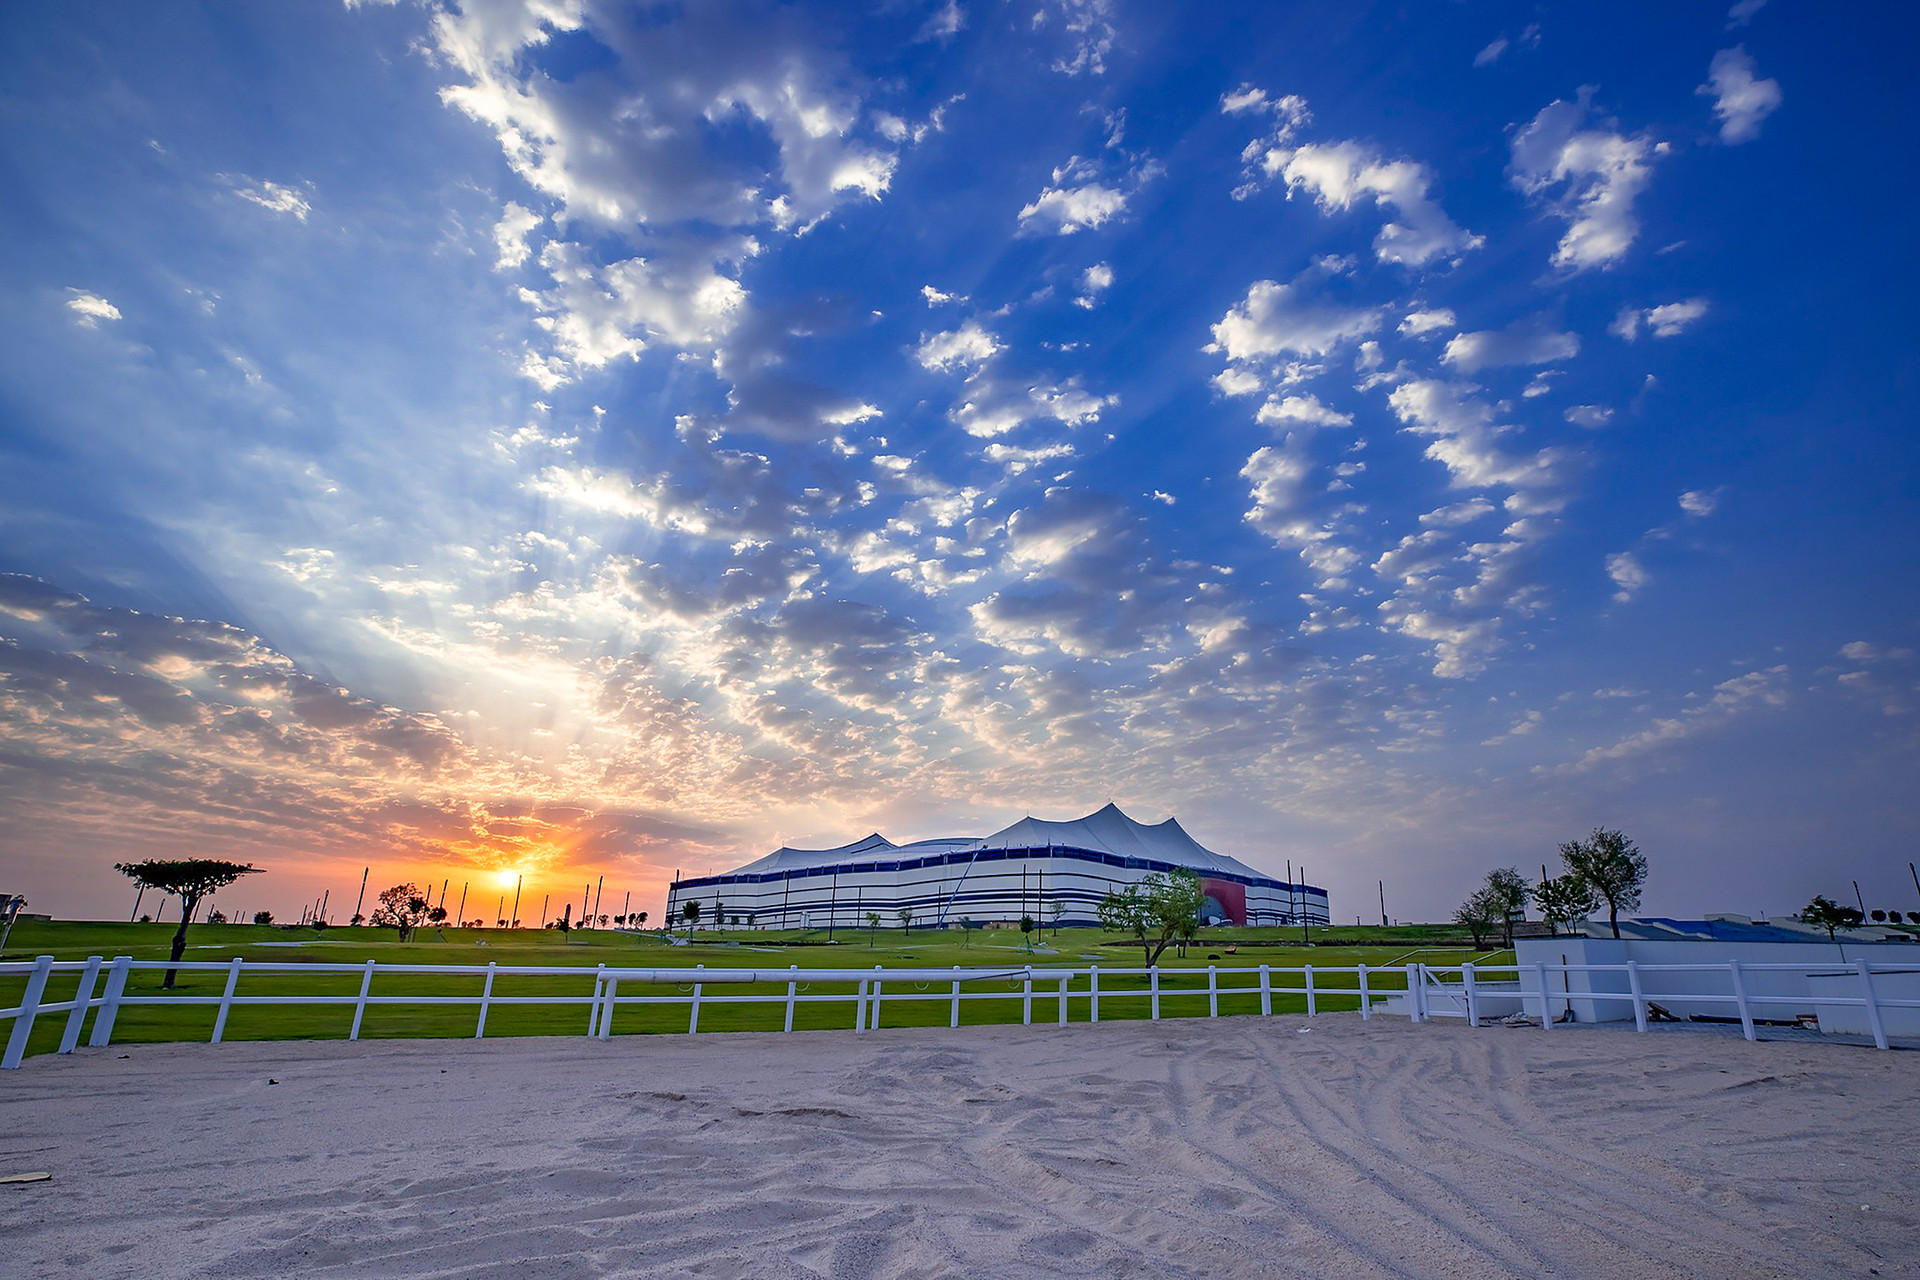 Al-bayt-stadium-sunset-horse-area.jpg